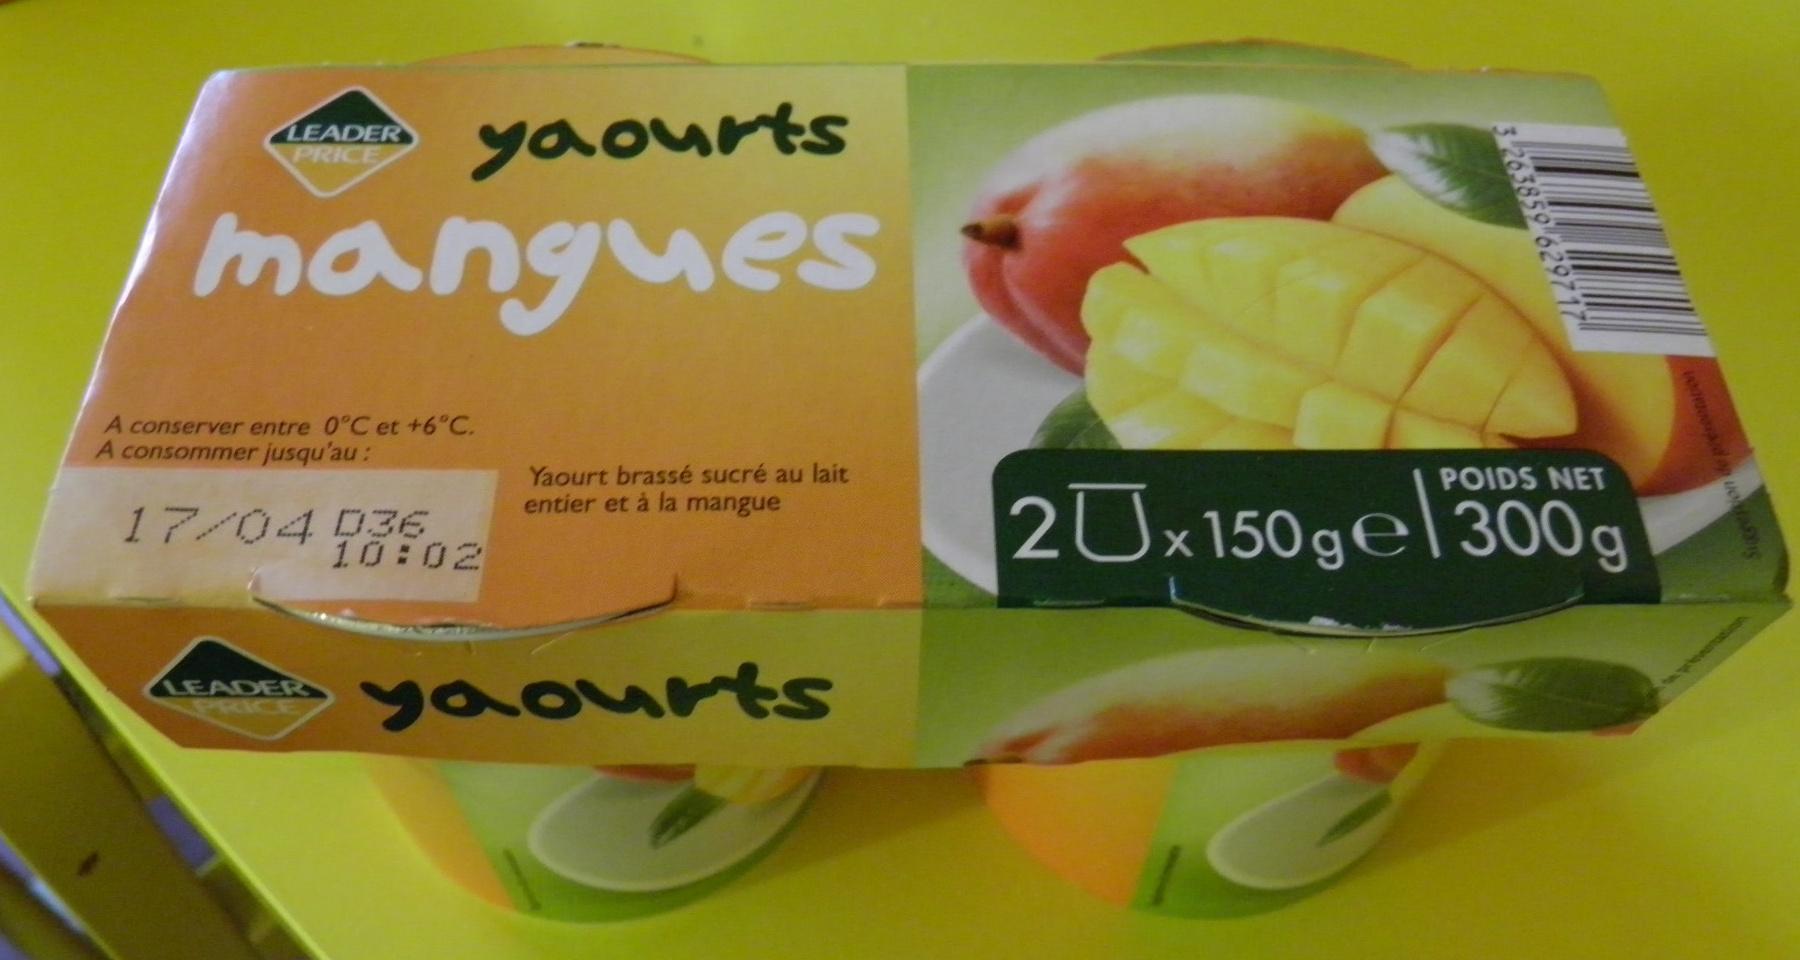 Yaourts Mangues - Produit - fr